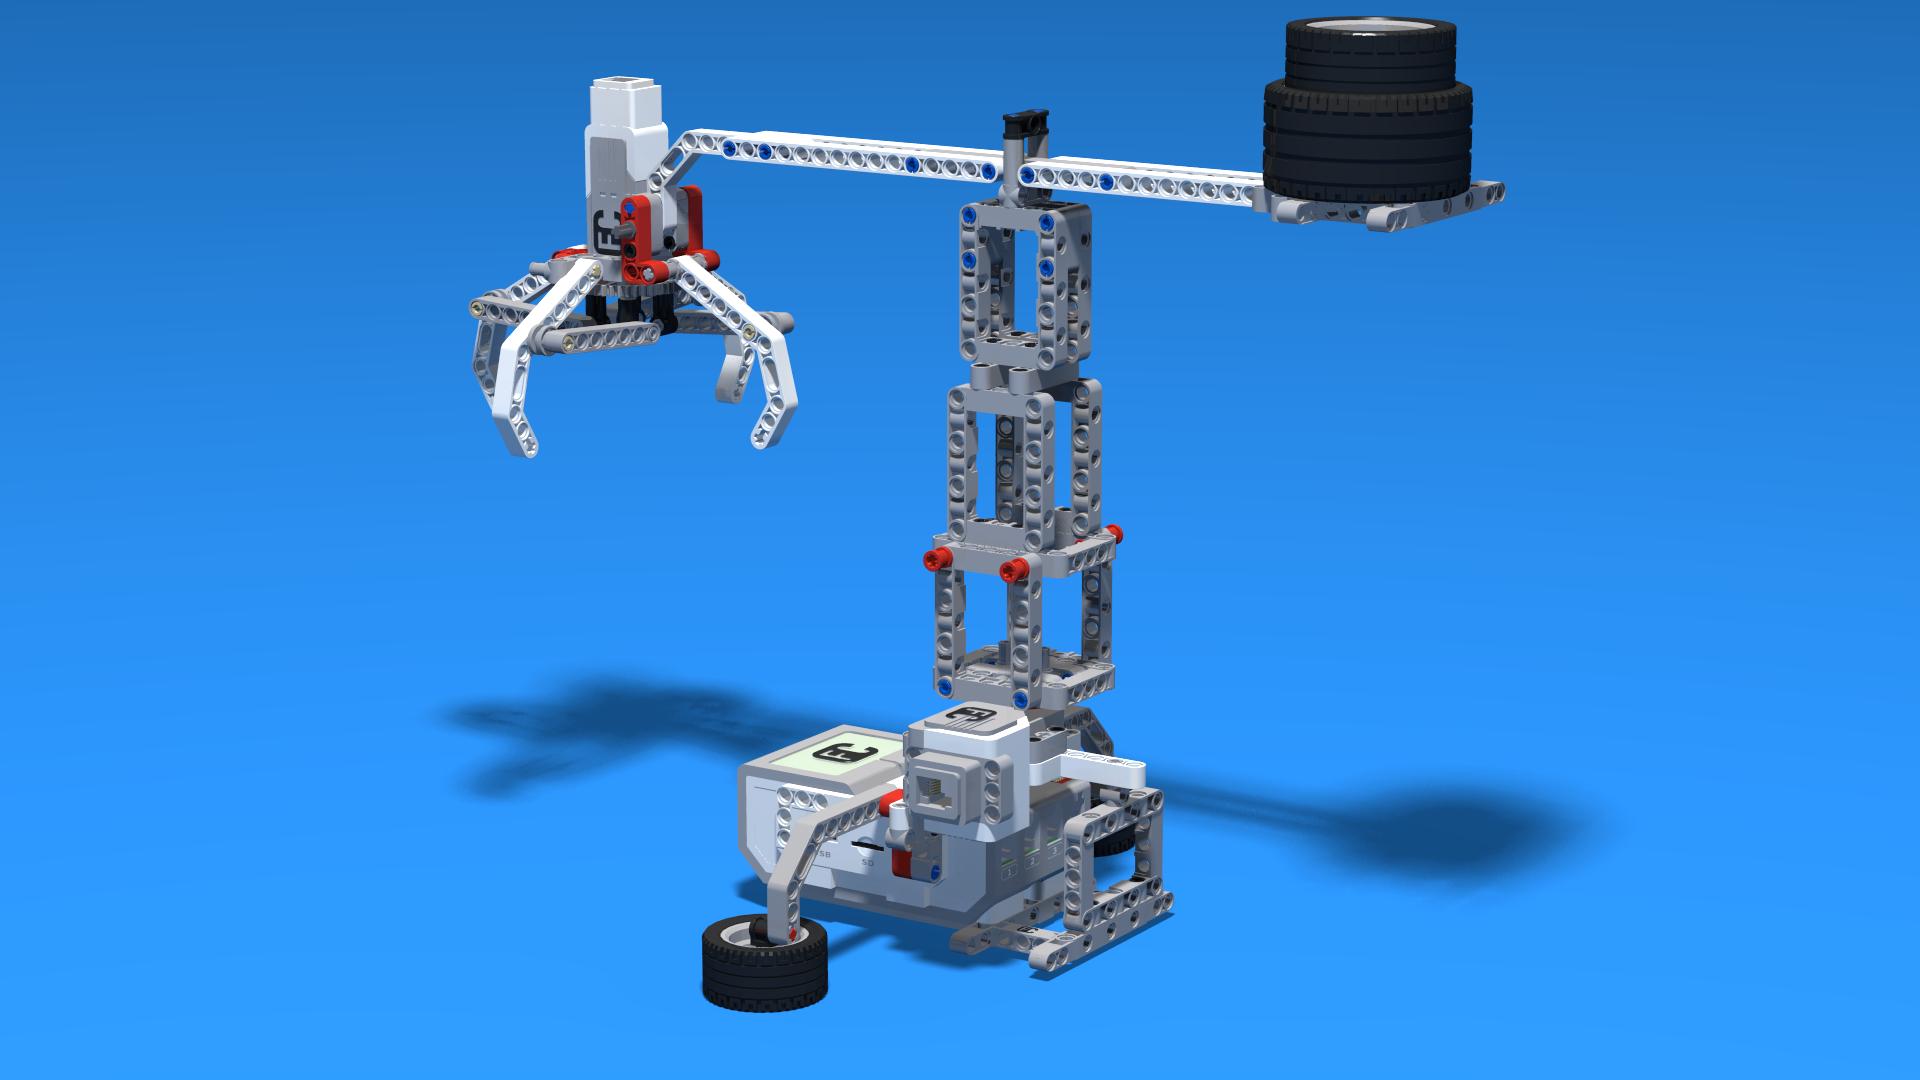 lego mindstorms nxt 2.0 crane instructions